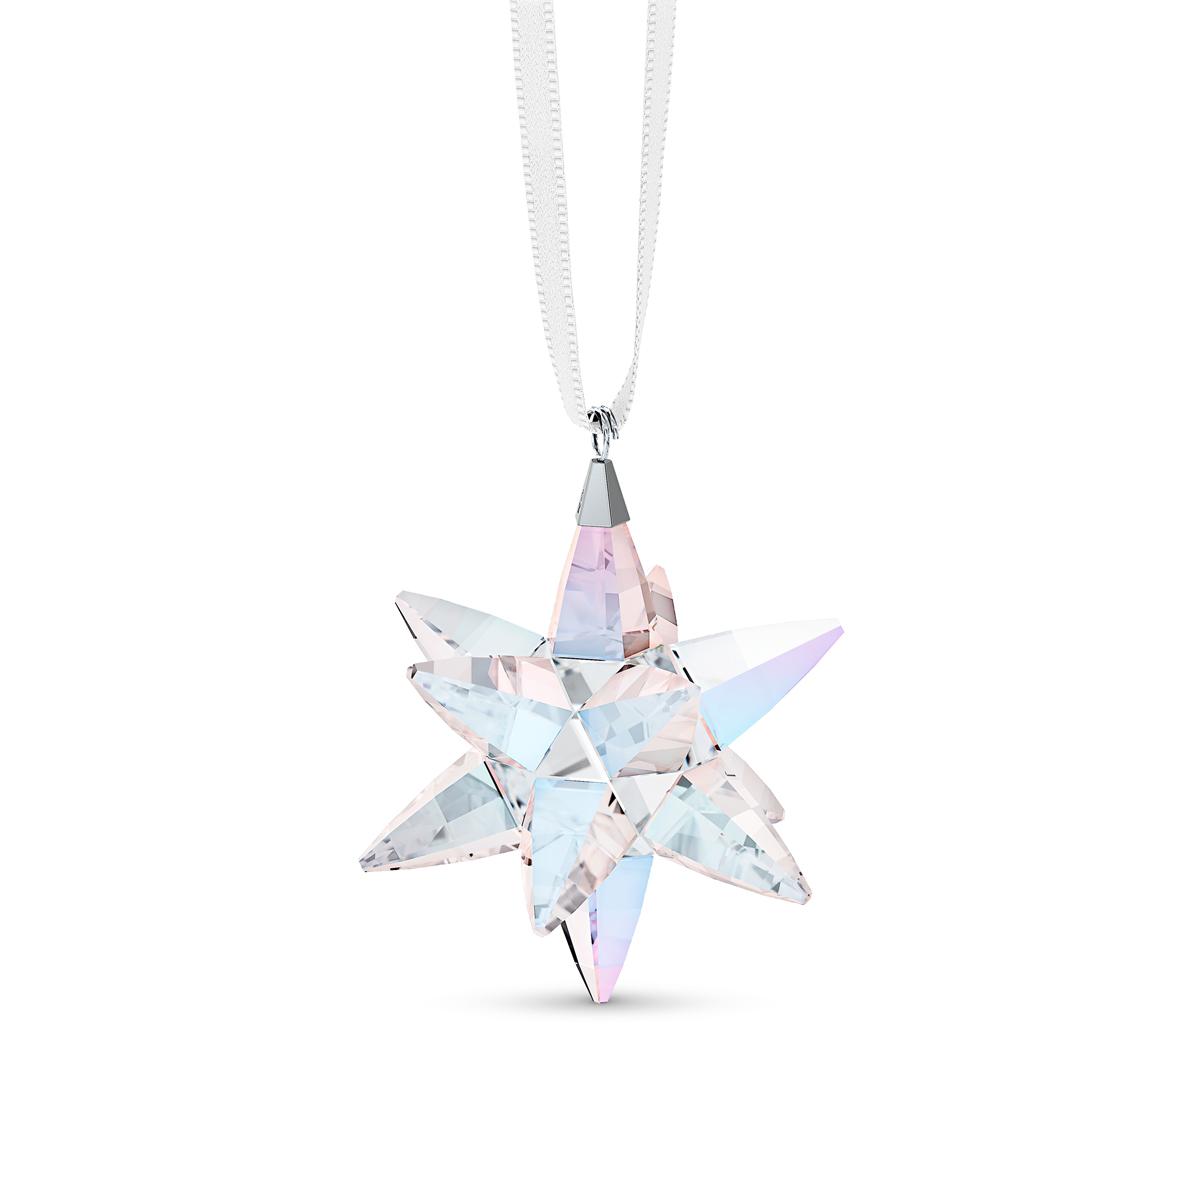 Swarovski Star Ornament, Shimmer, Small